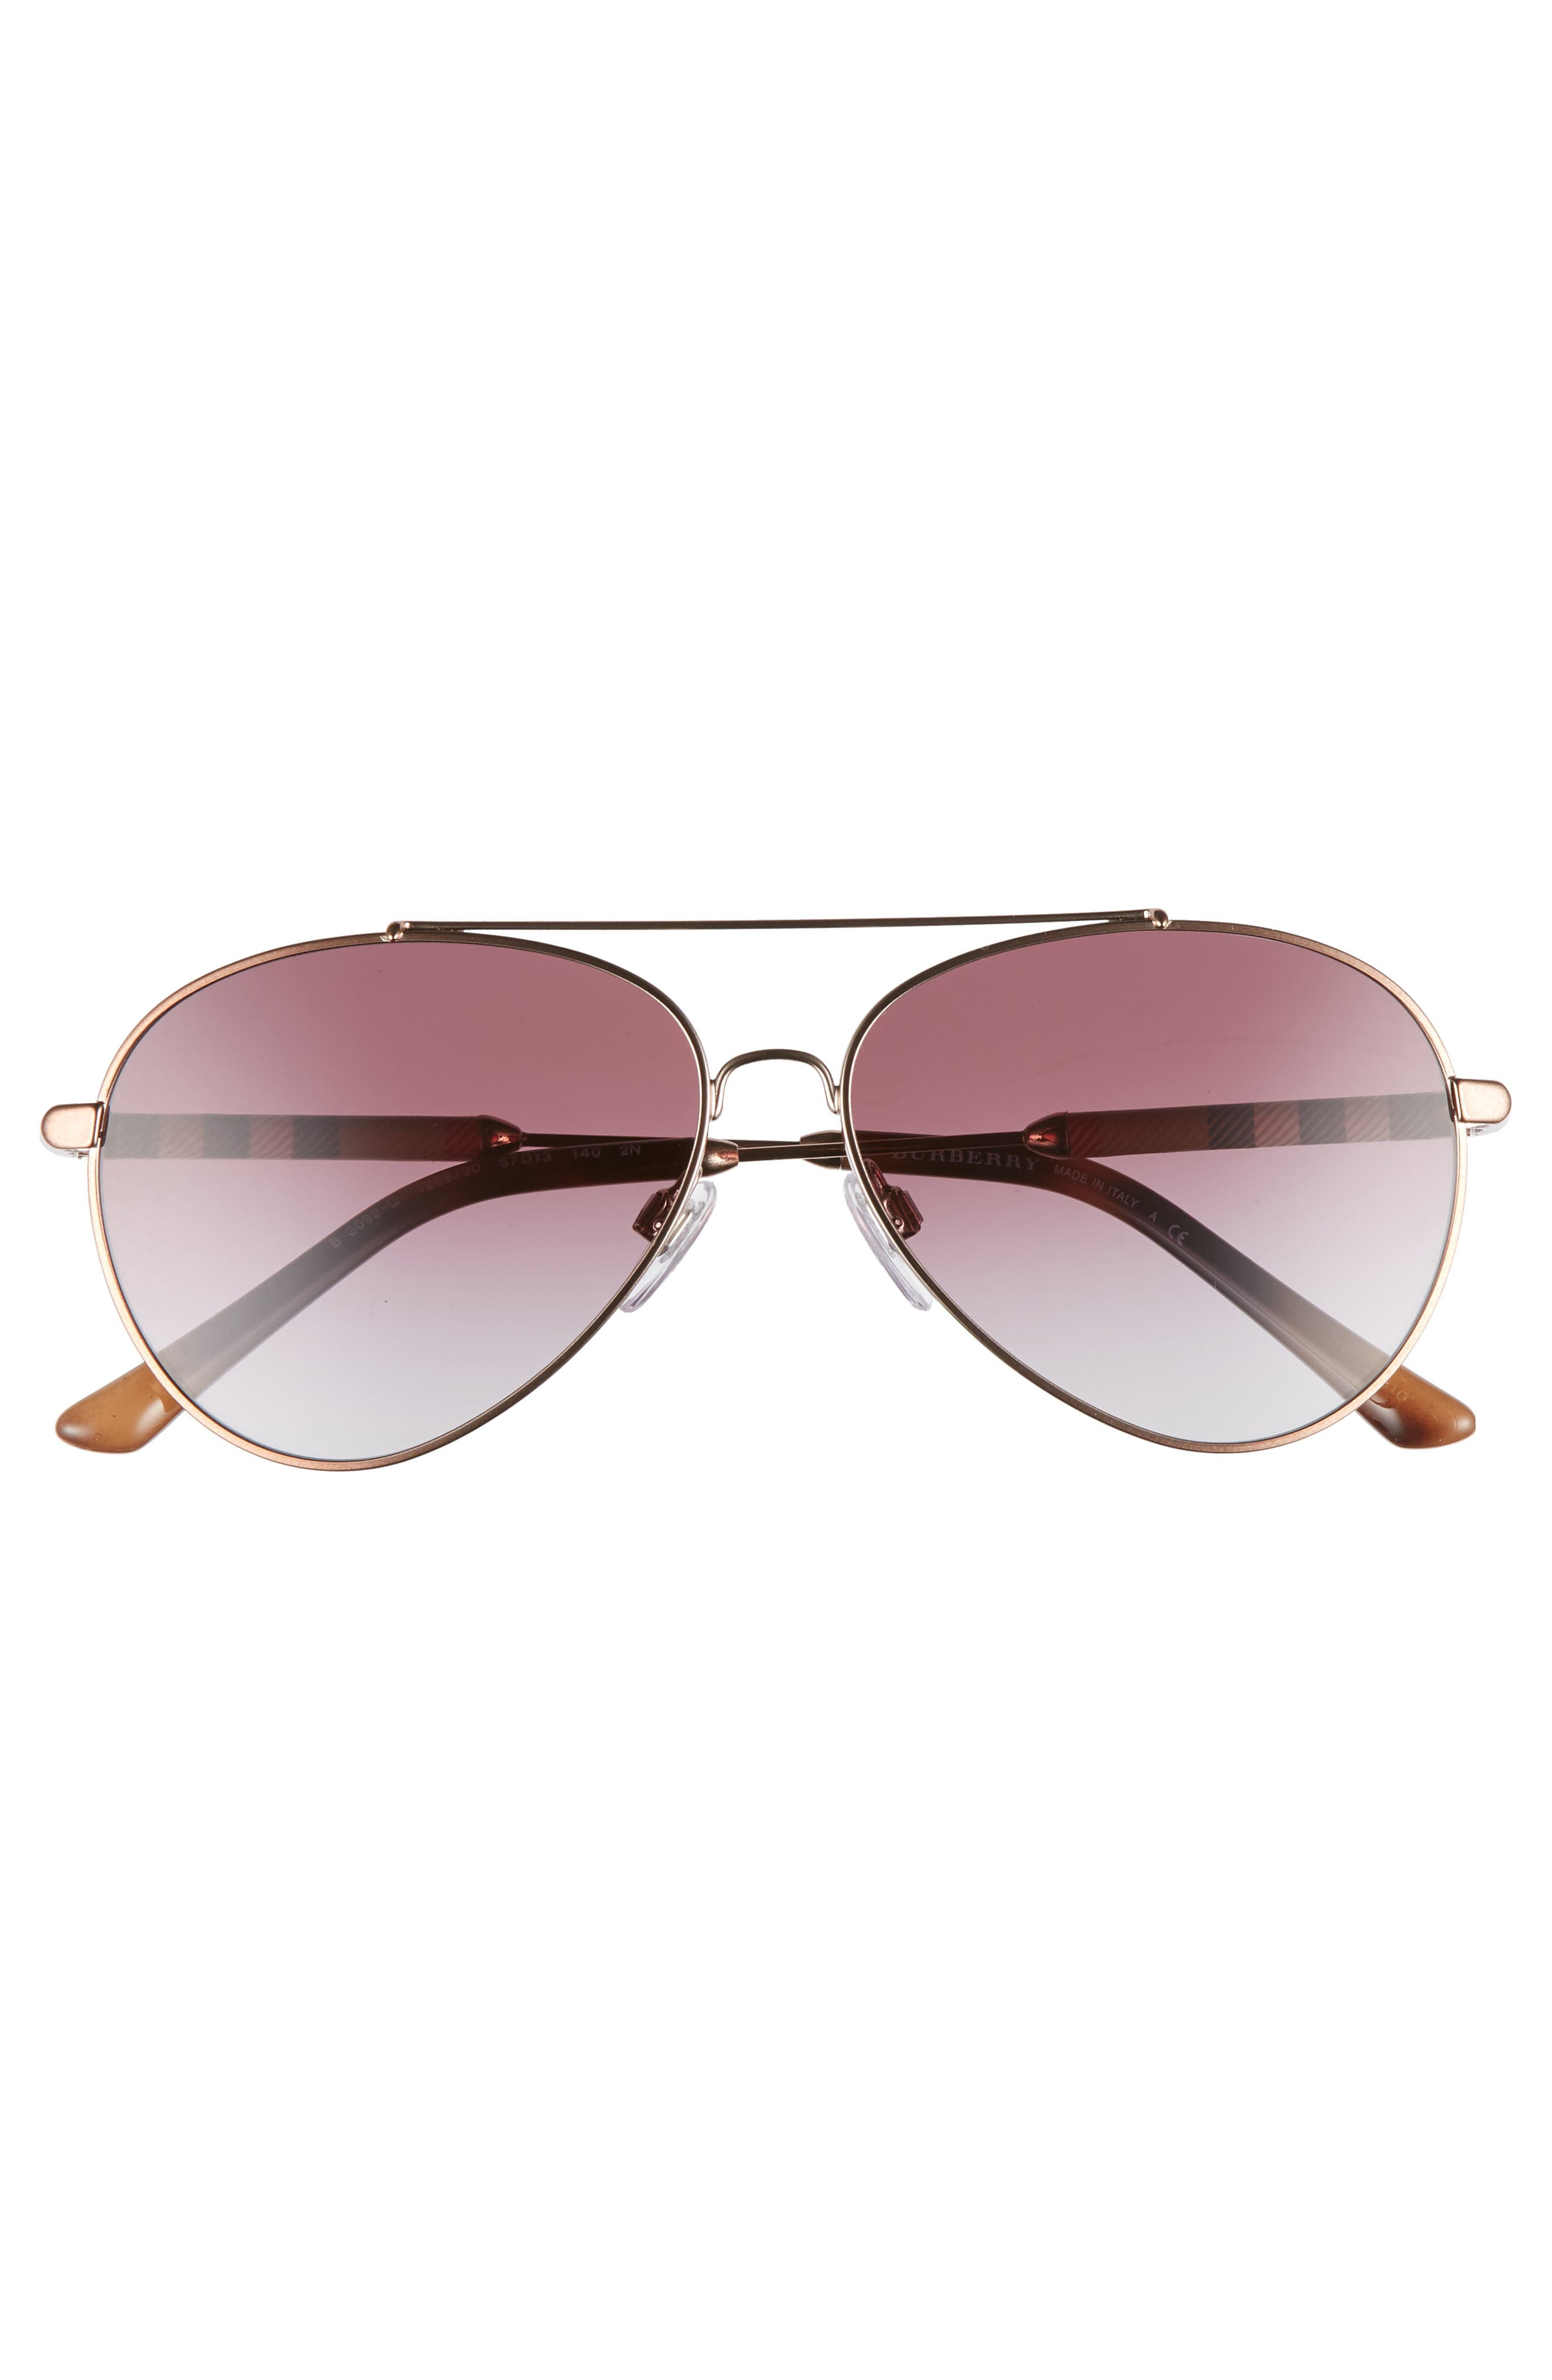 57mm Mirrored Aviator Sunglasses,                             Alternate thumbnail 3, color,                             VIOLET GRADIENT